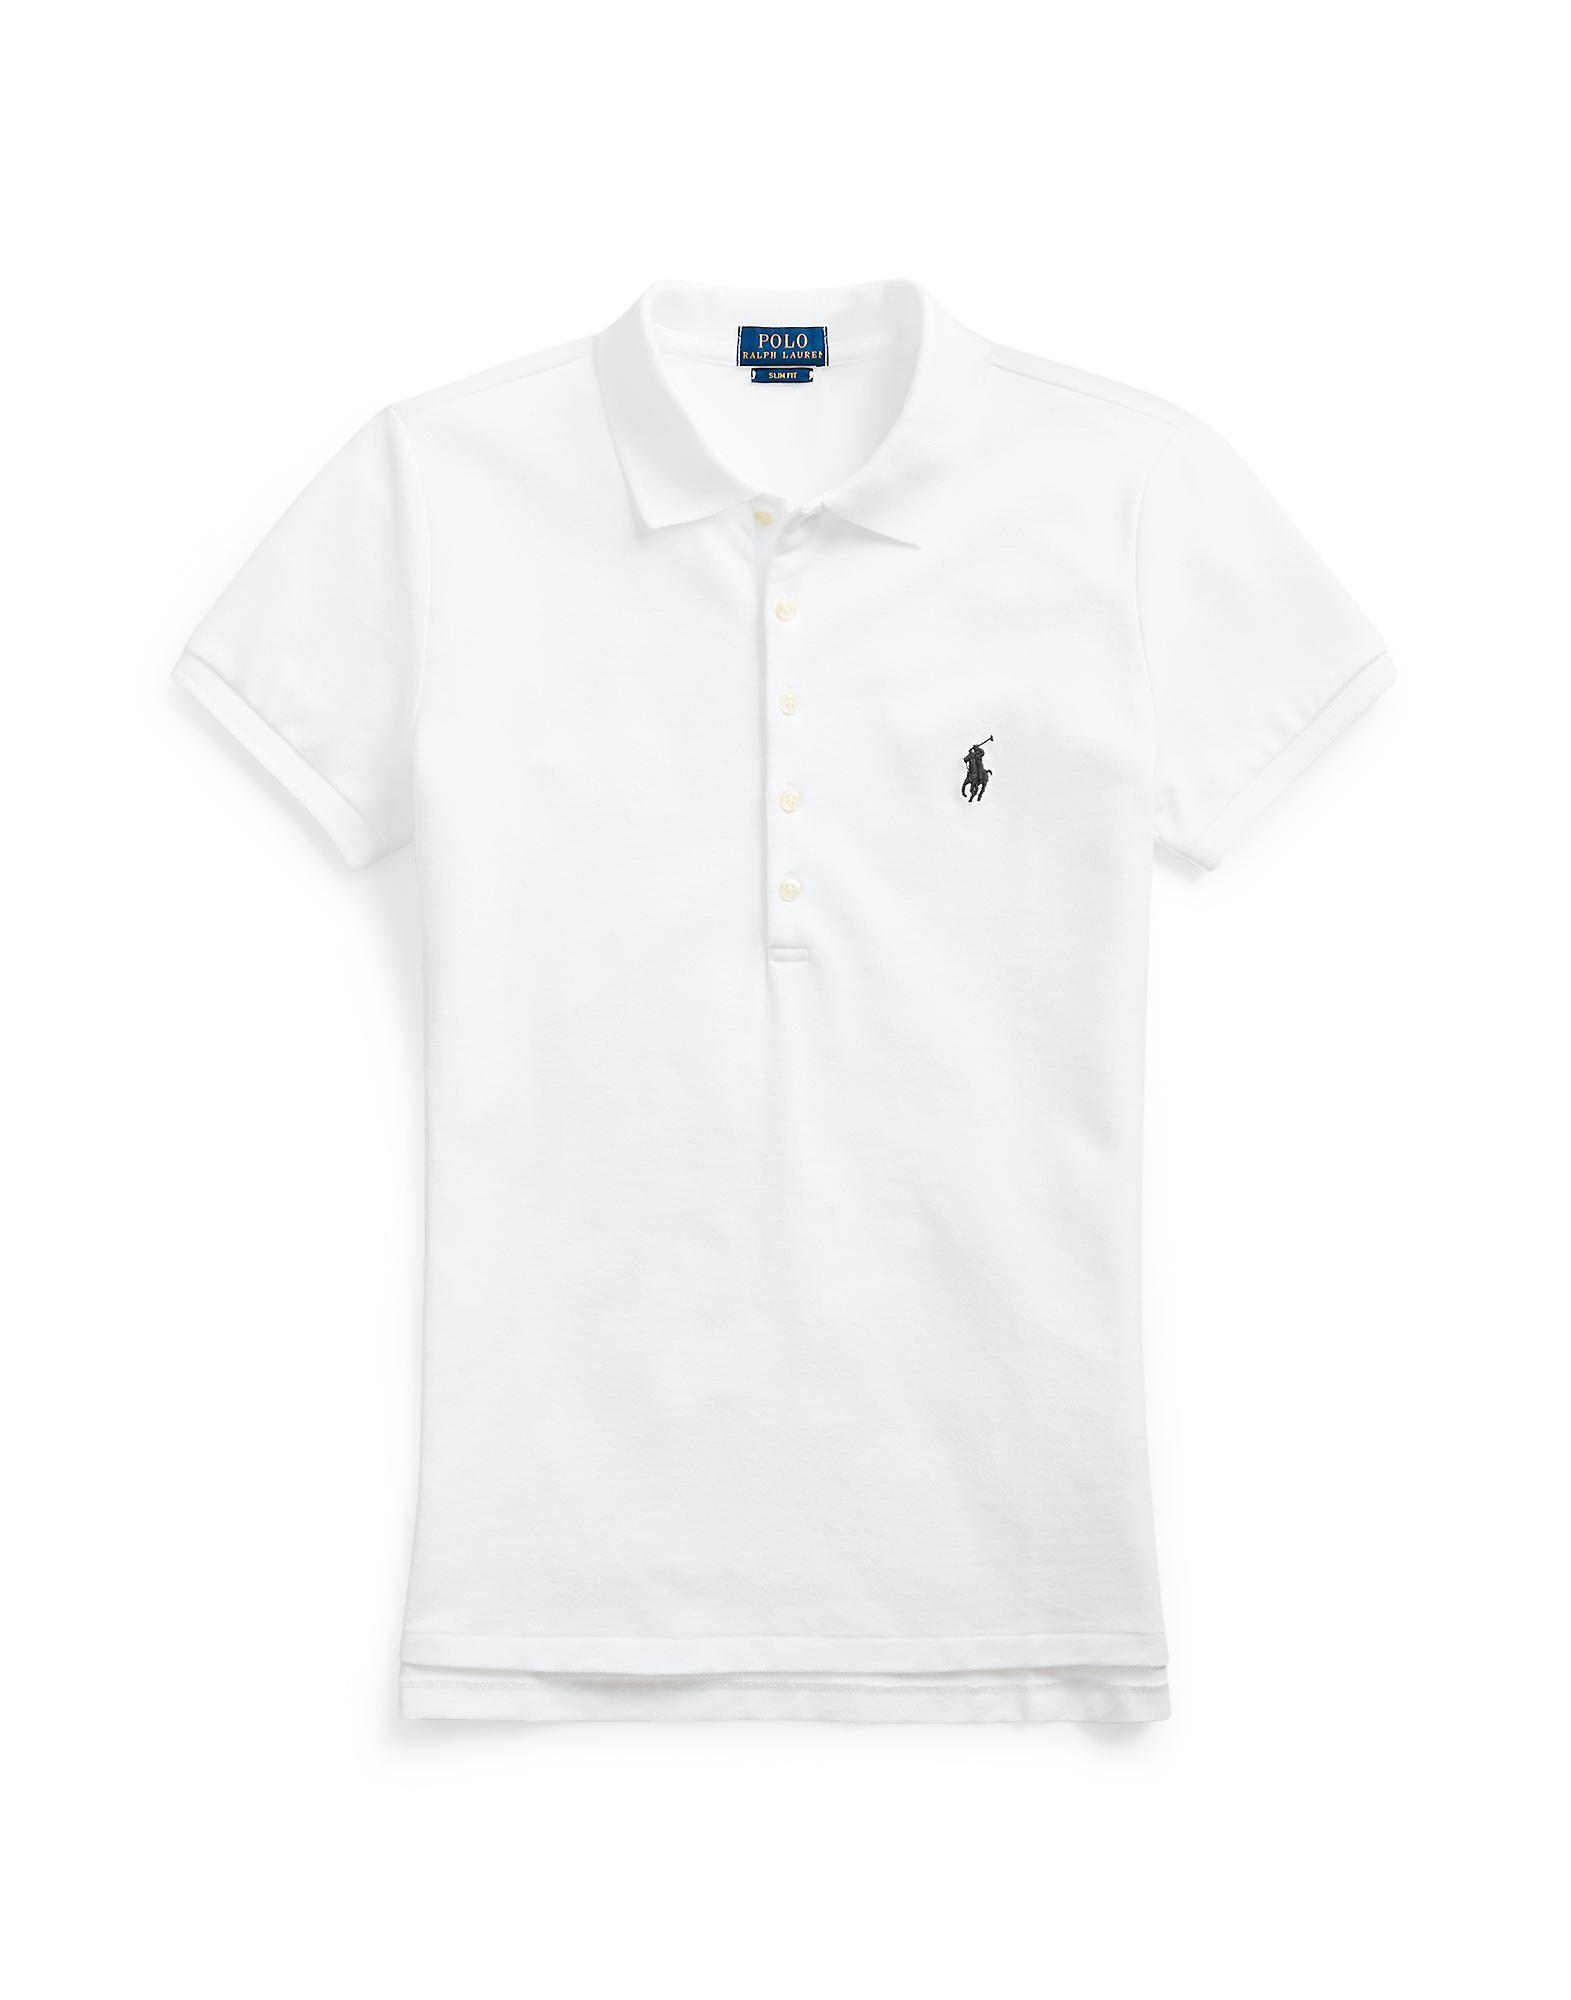 7c94e6288676 Polo Ralph Lauren Skinny Fit Stretch Mesh Polo - Polo Shirt - Women ...